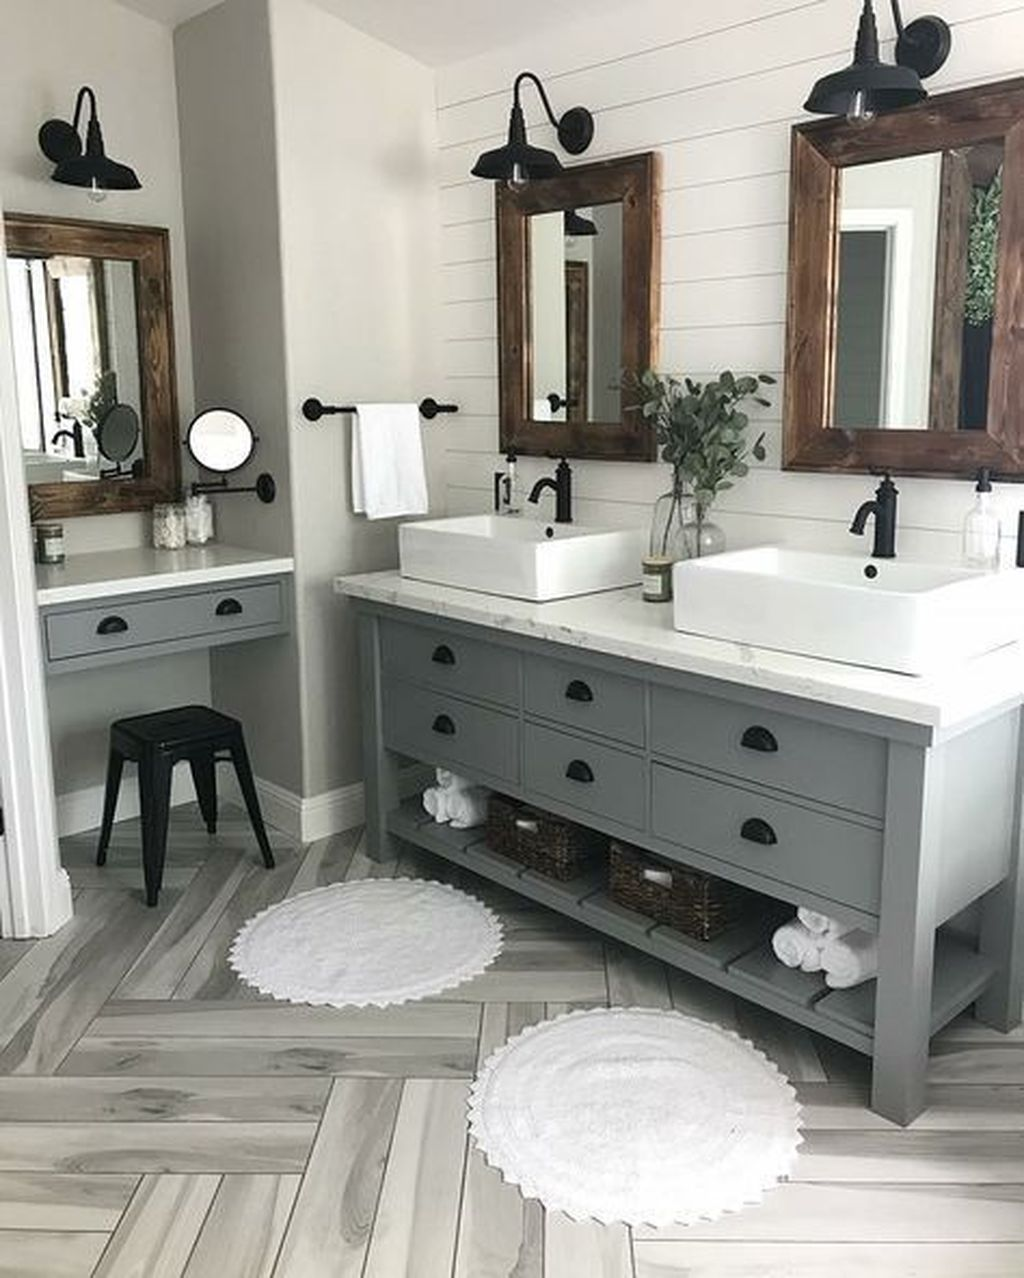 Fascinating Rustic Bathroom Decor Ideas You Must Copy 21